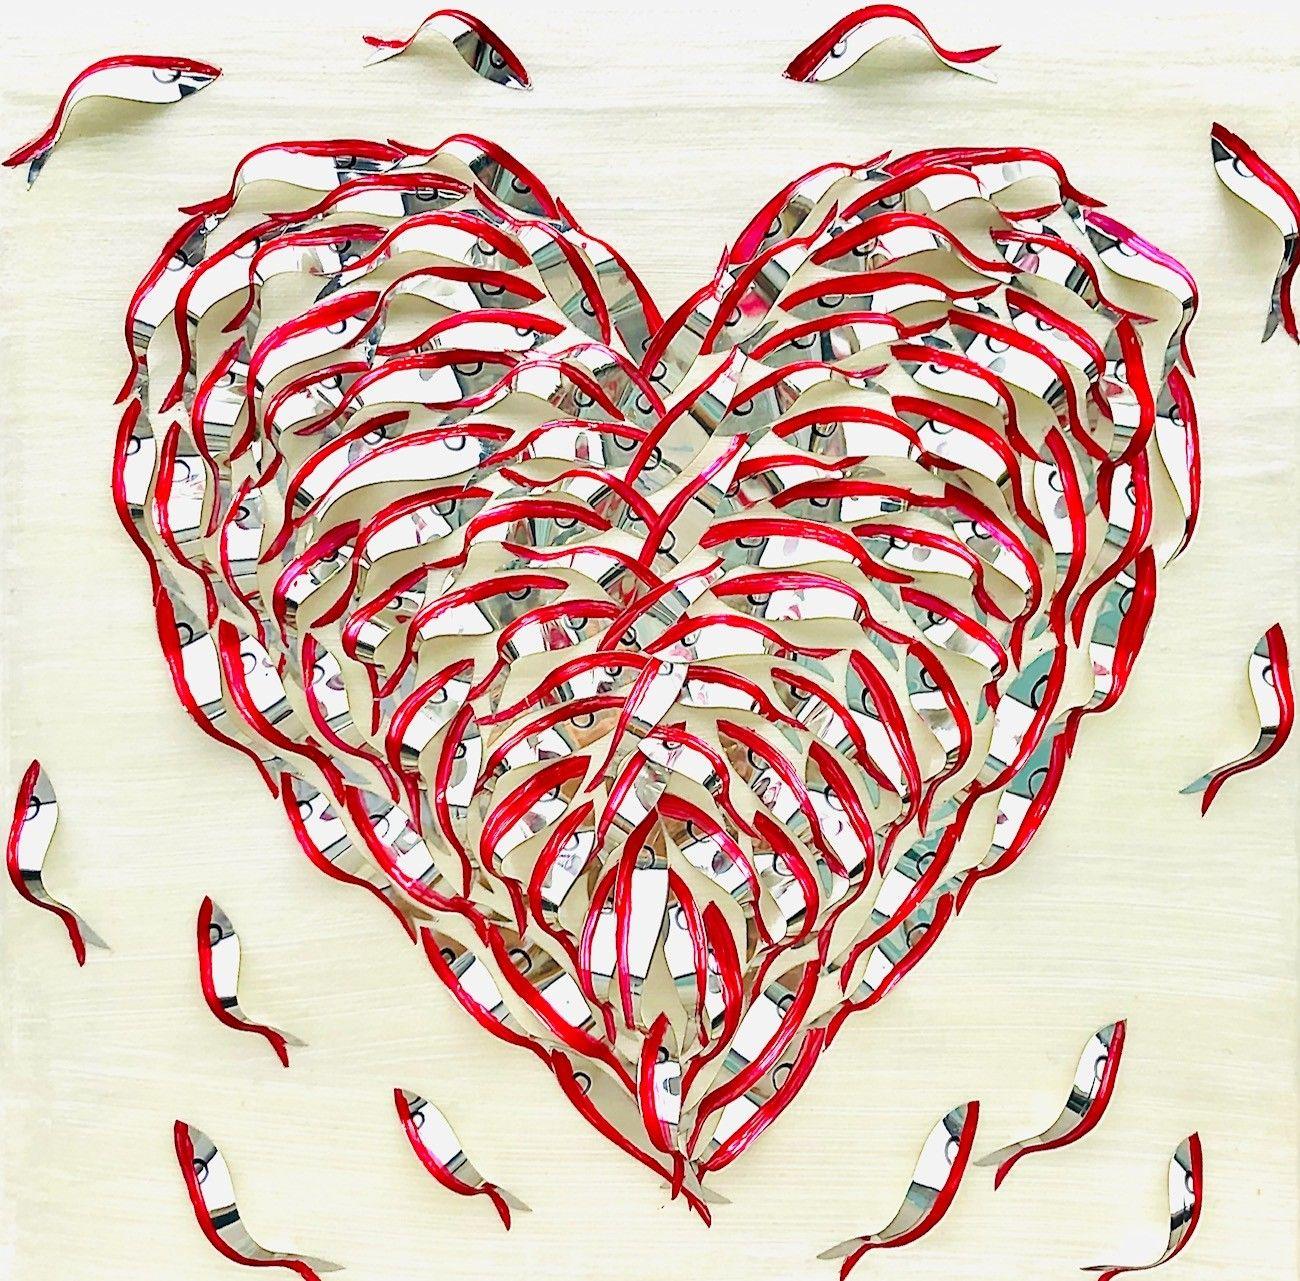 "BARBARA PECORARI "" SARDINES LEAPING OUT POP HEART 2 - MINI ""  dimensioni L 30 x H 30 cm."